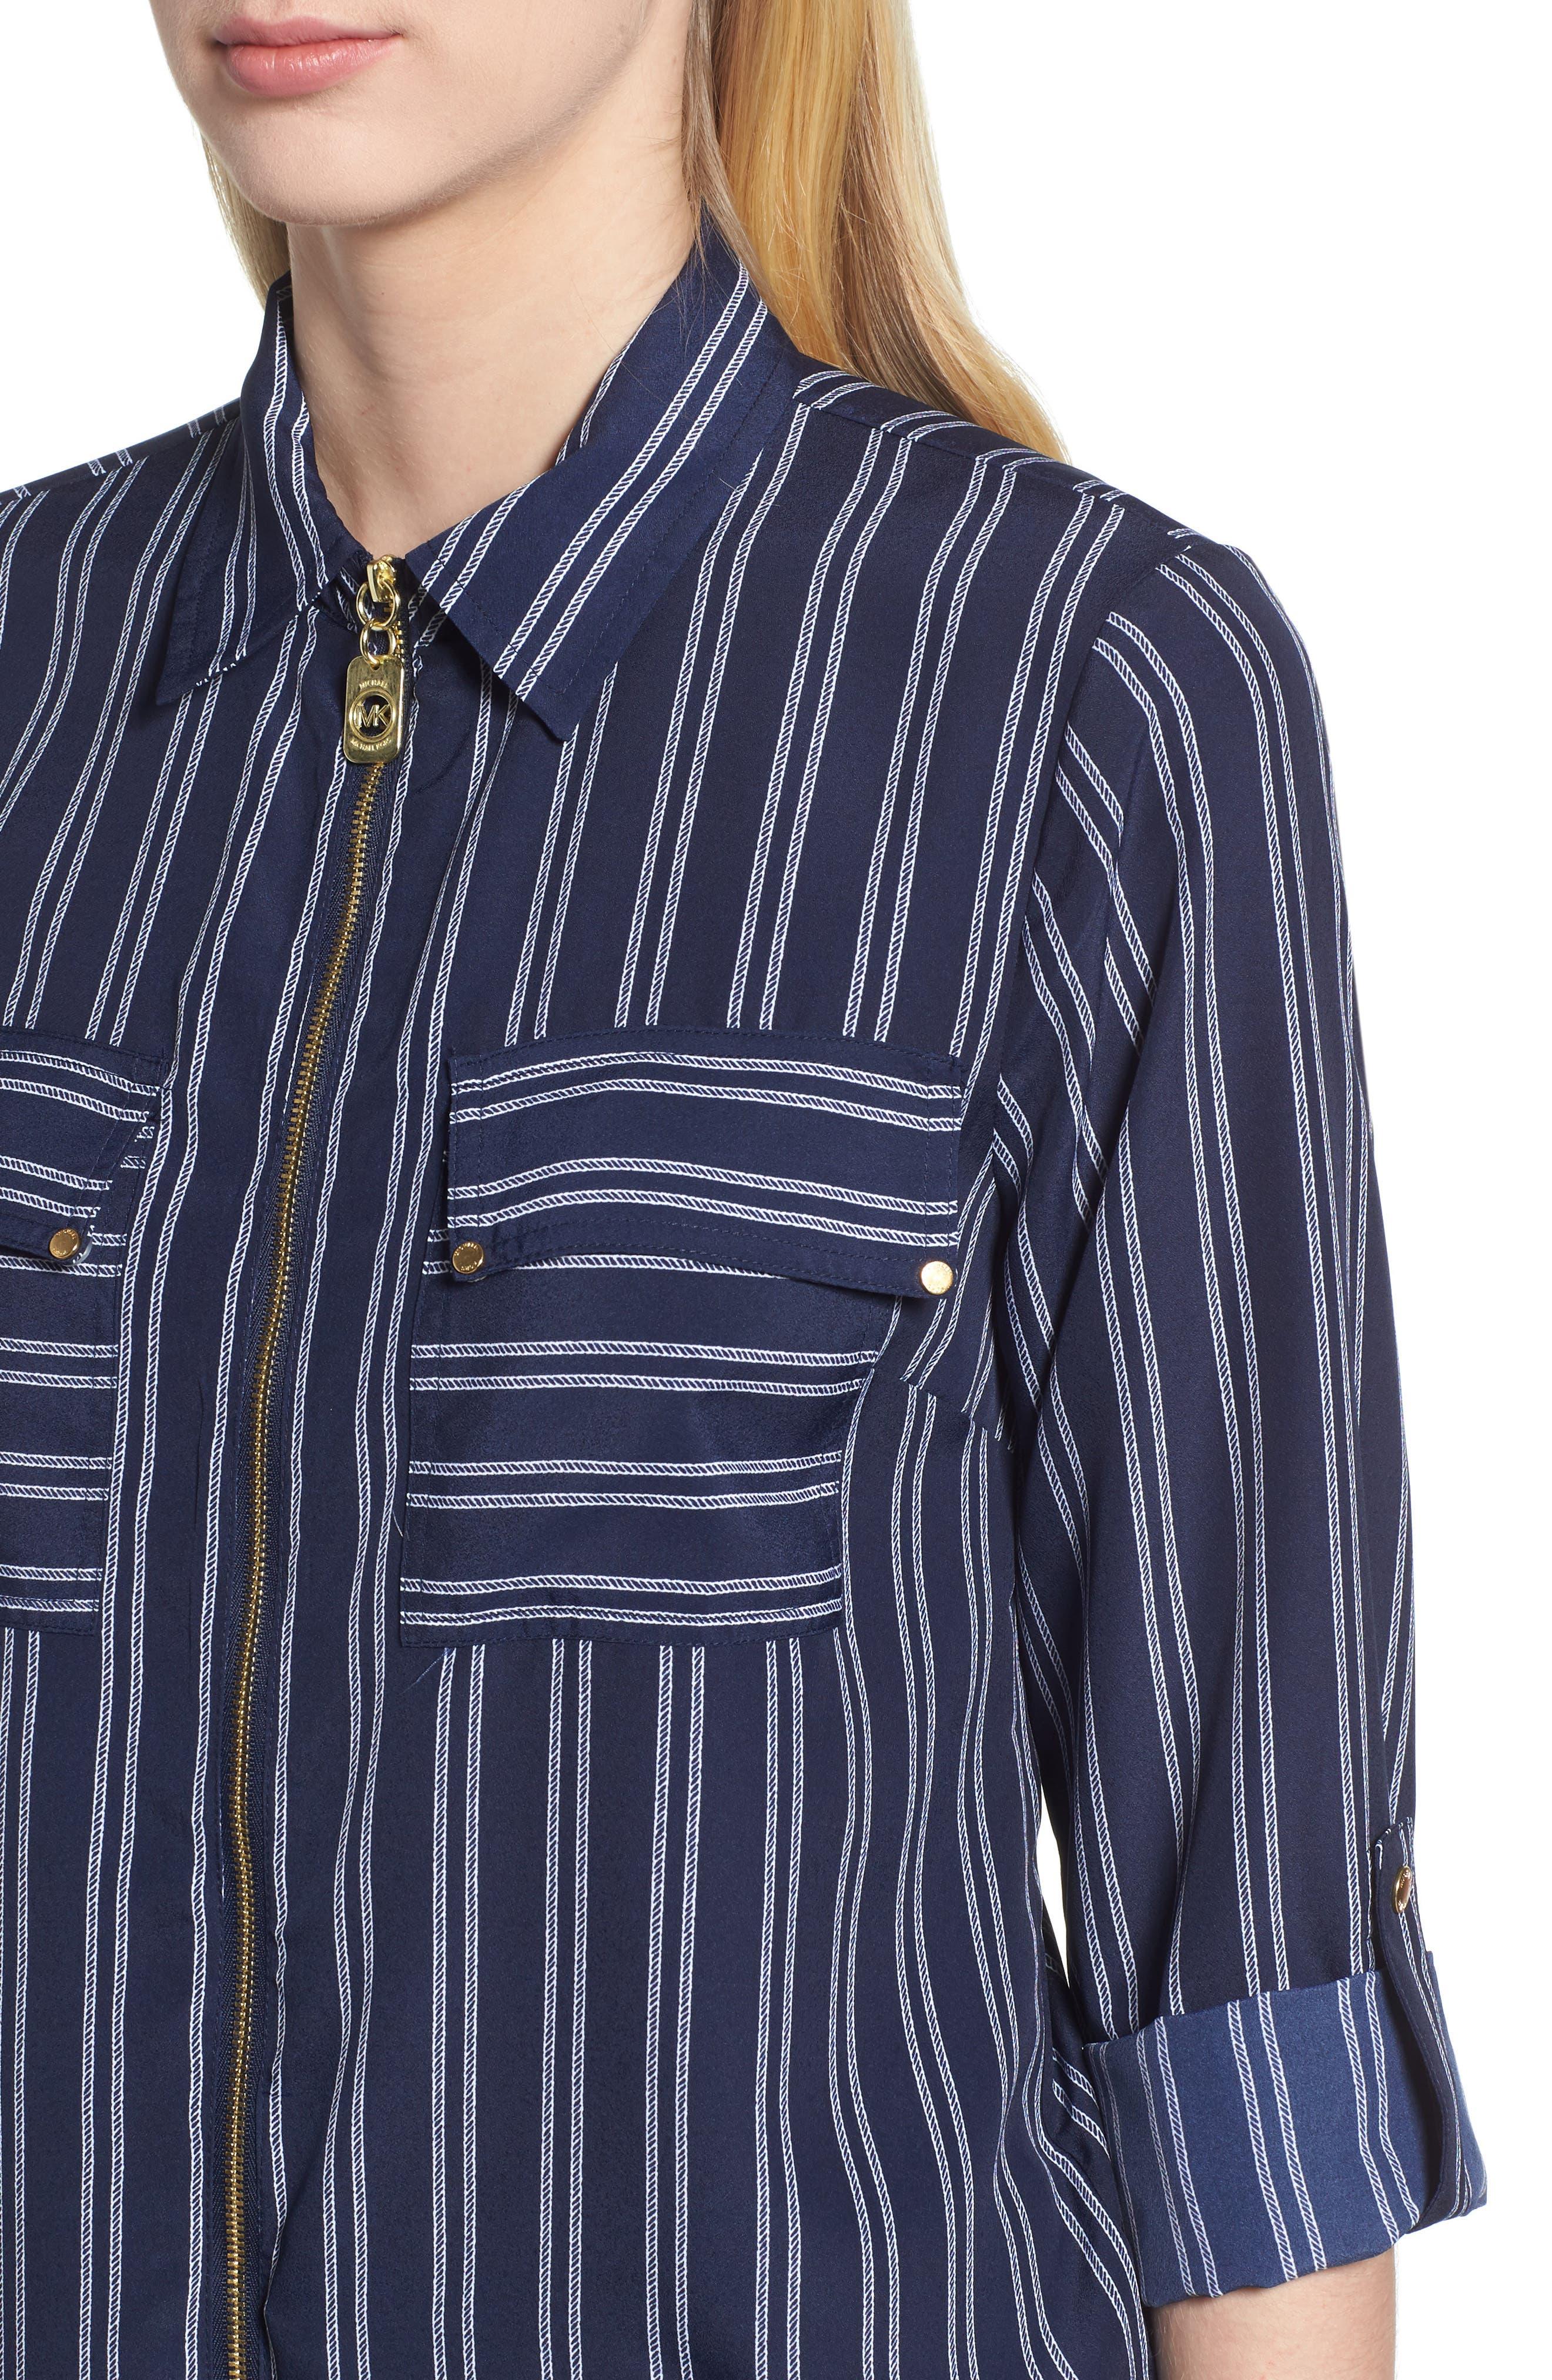 MICHAEL Michael Kors Bengal Striped Shirt,                             Alternate thumbnail 4, color,                             TRUE NAVY